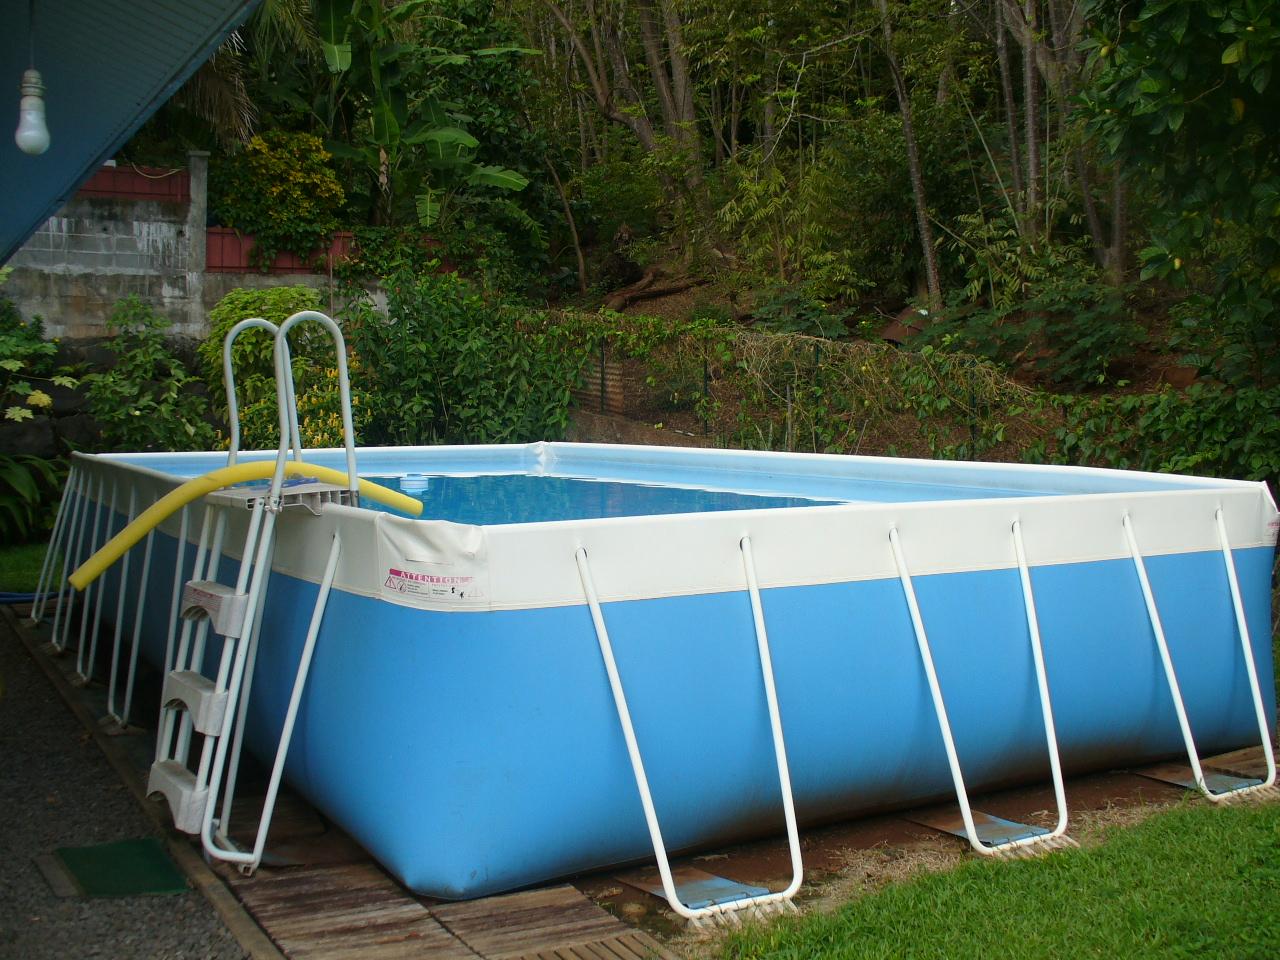 piscine laghetto 8x4 petites annonces tahiti infos. Black Bedroom Furniture Sets. Home Design Ideas